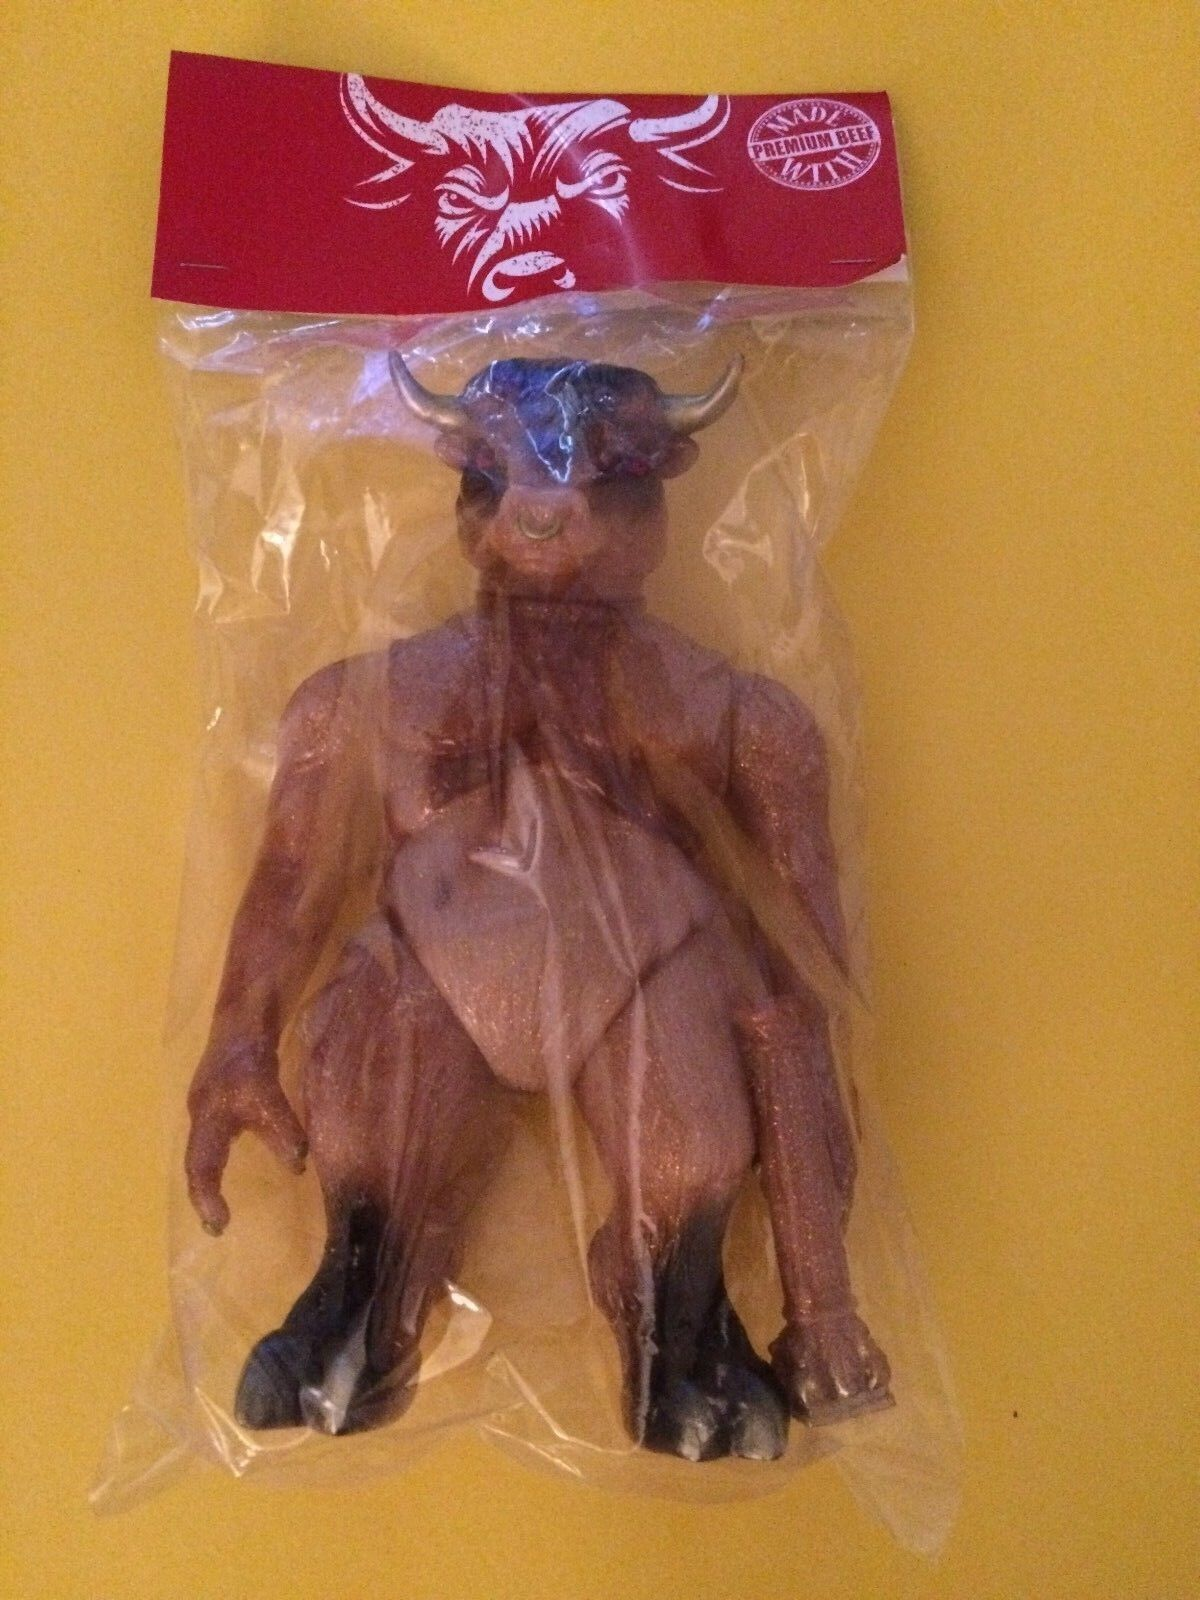 Splurrt Tauro DCON Painted Edition Sealed In Bag With Header Bemon Kaiju MVH